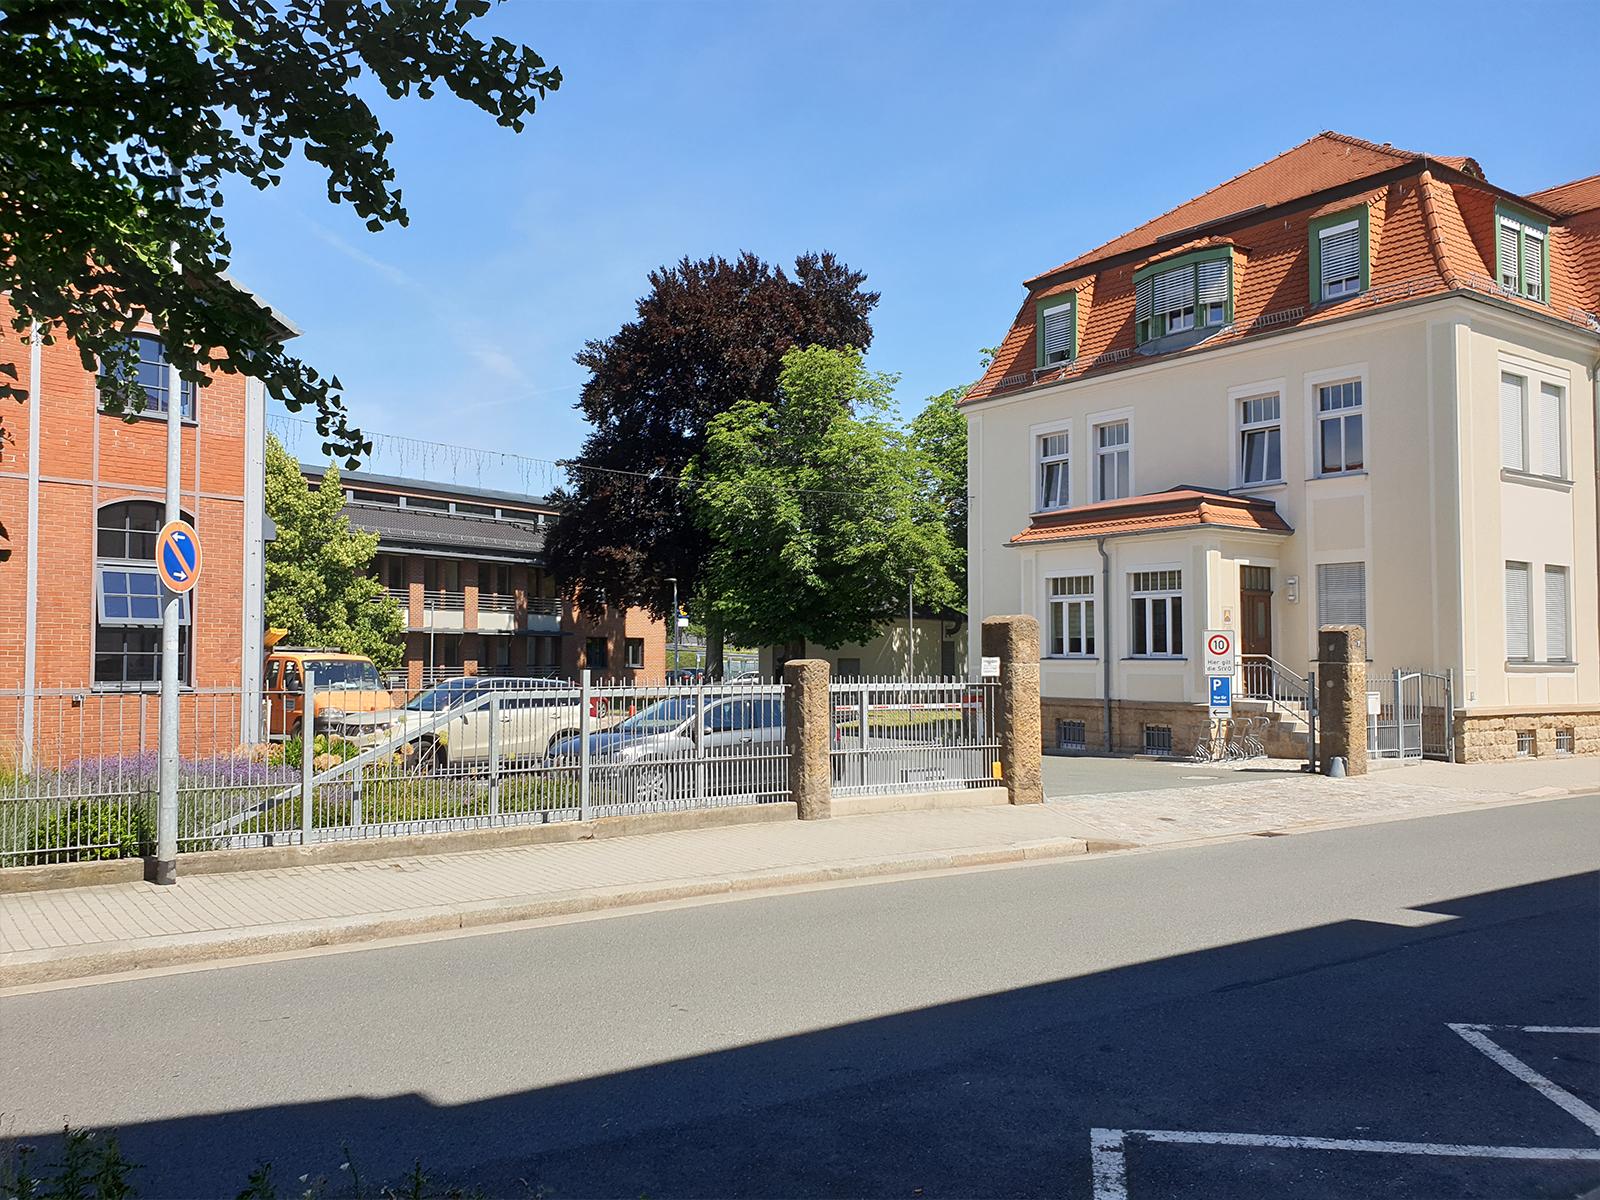 Haus_der_Stadtgesellschaften_Freital_Ansicht